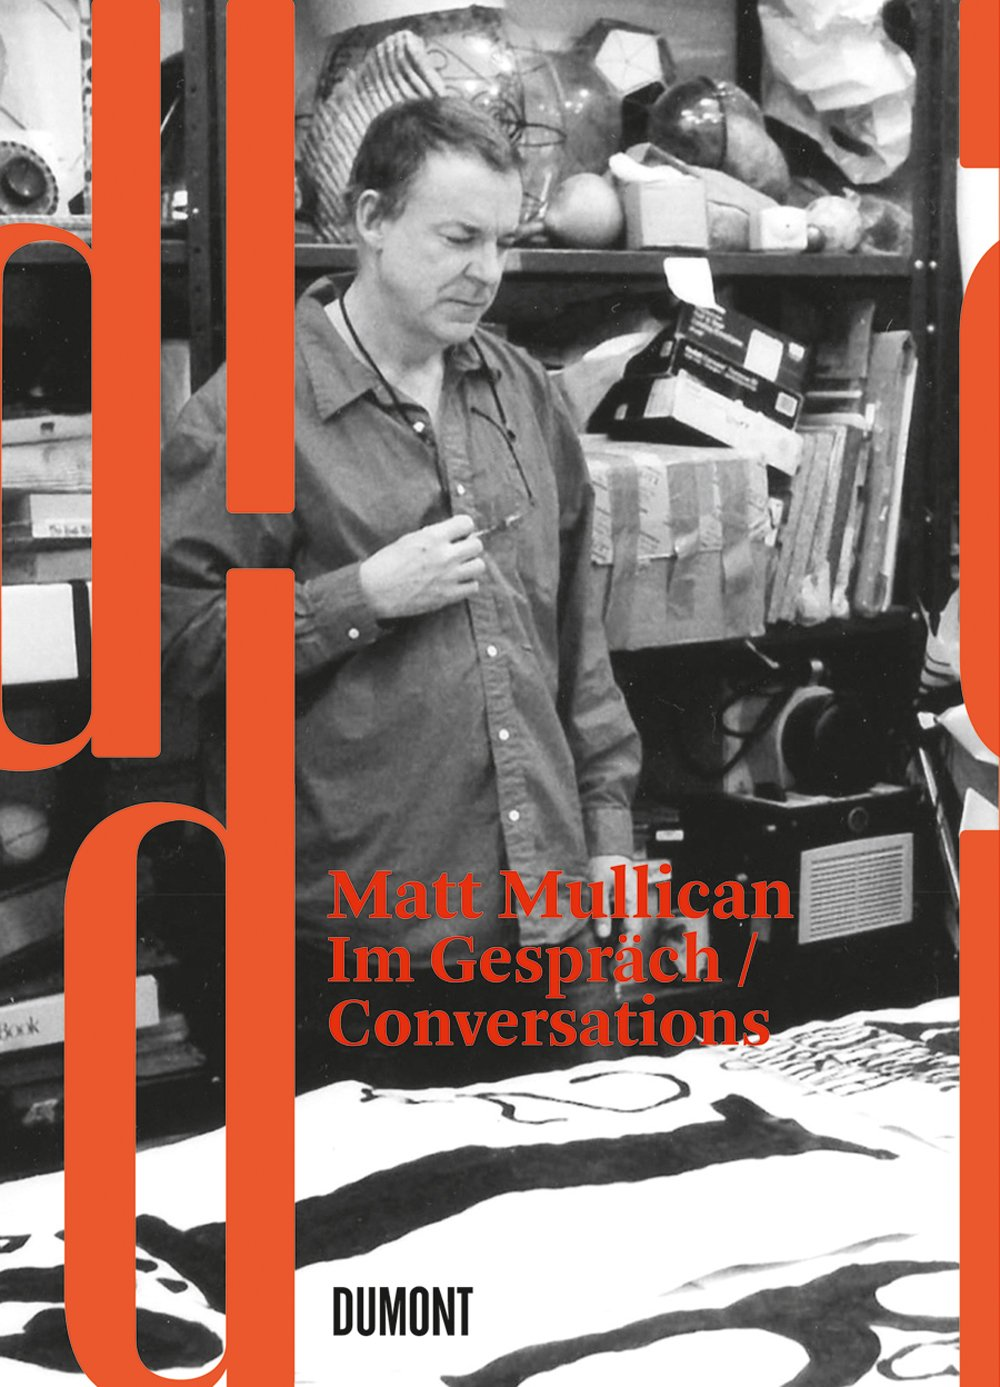 Download Matt Mullican: Conversations (Dumont Dokumente) PDF